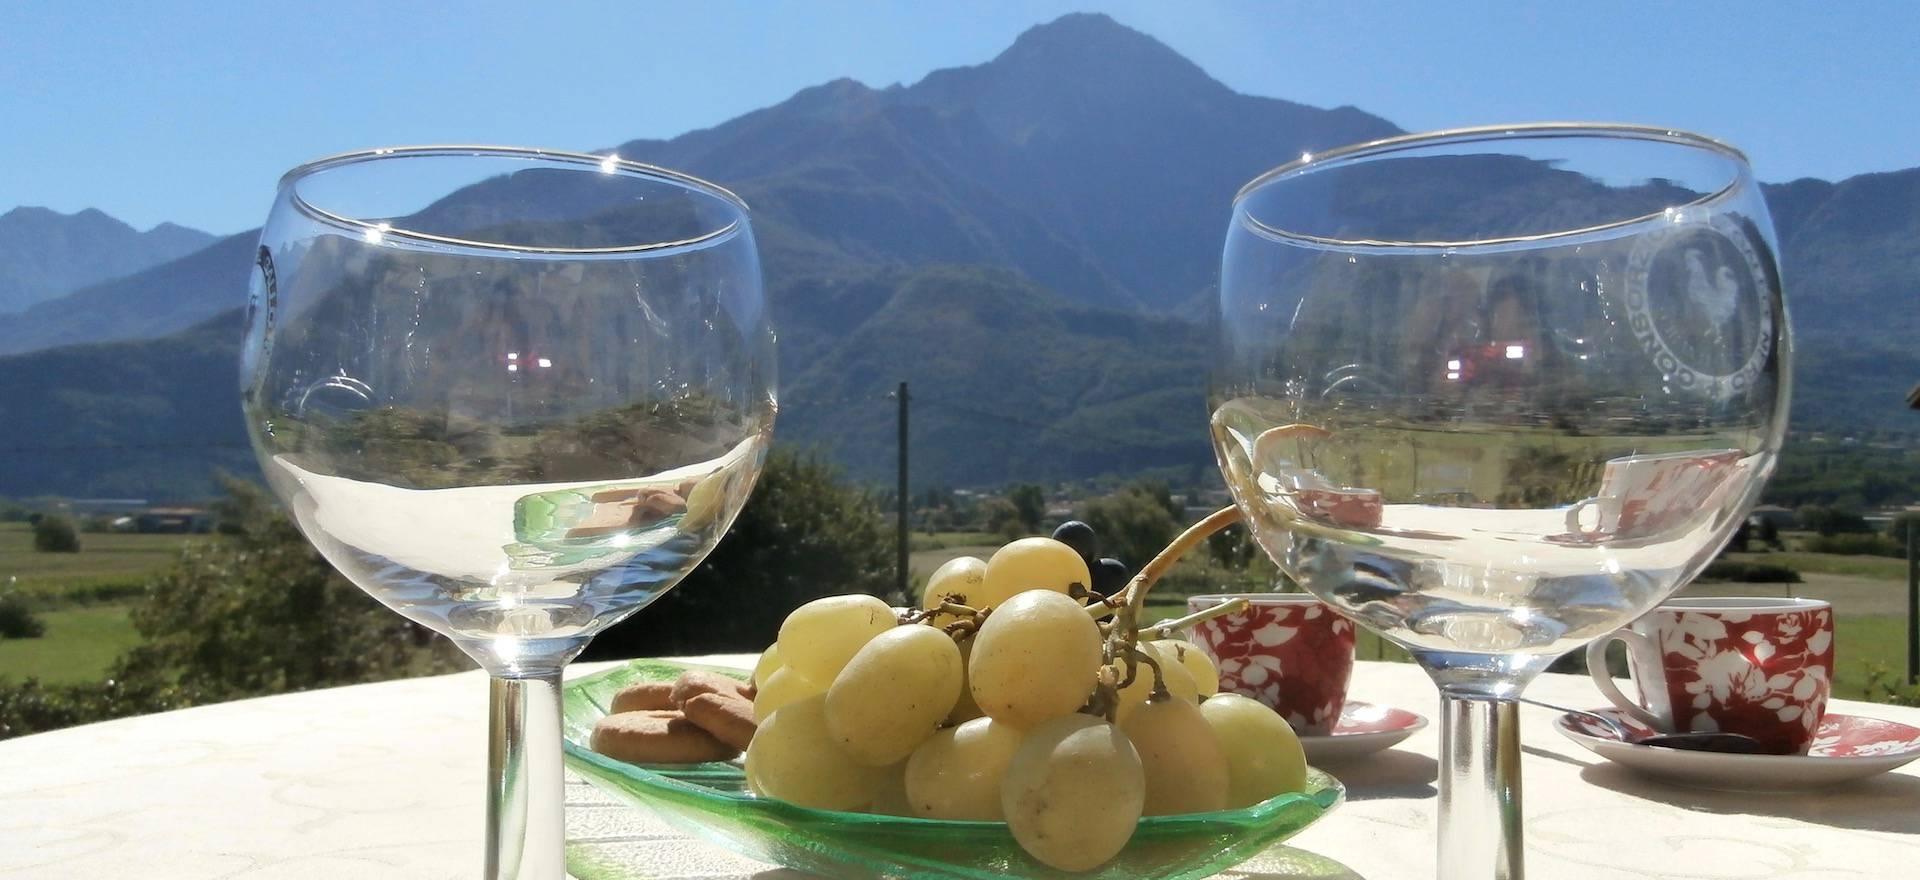 Agriturismo Lake Como and Lake Garda Characteristic agriturismo near Lake Como